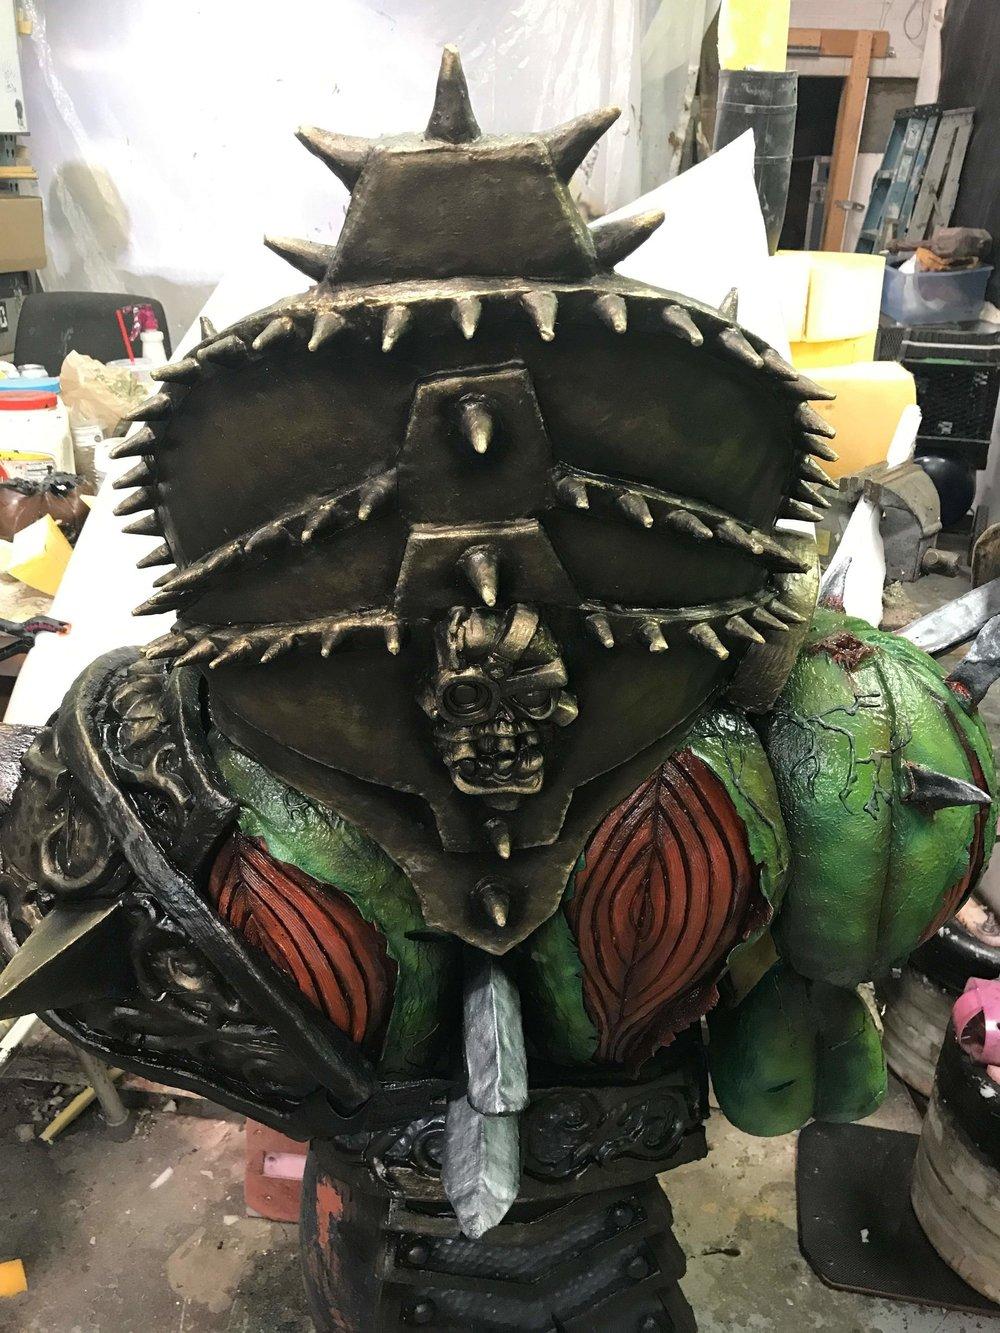 Bonesnapper Armor and Body